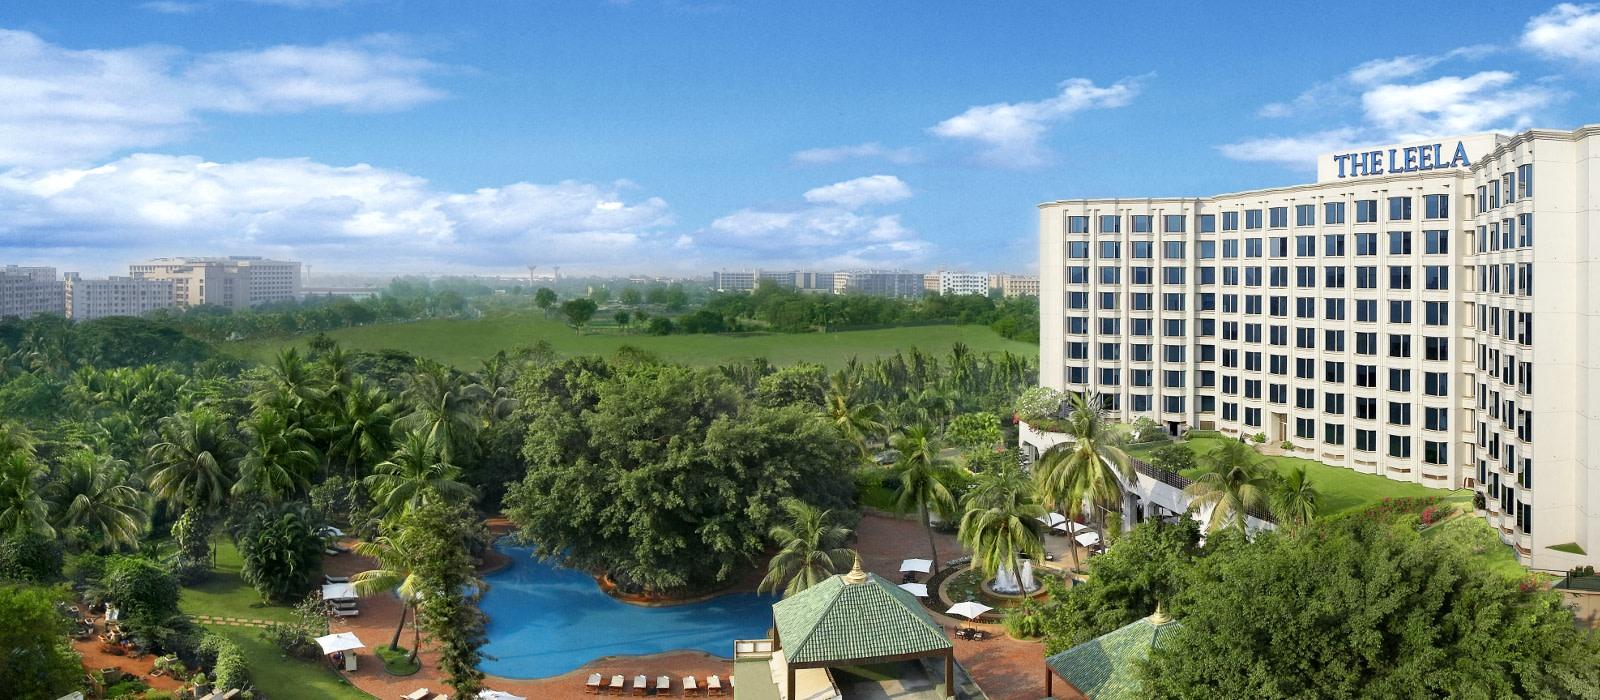 Hotel The Leela Mumbai Central & West India